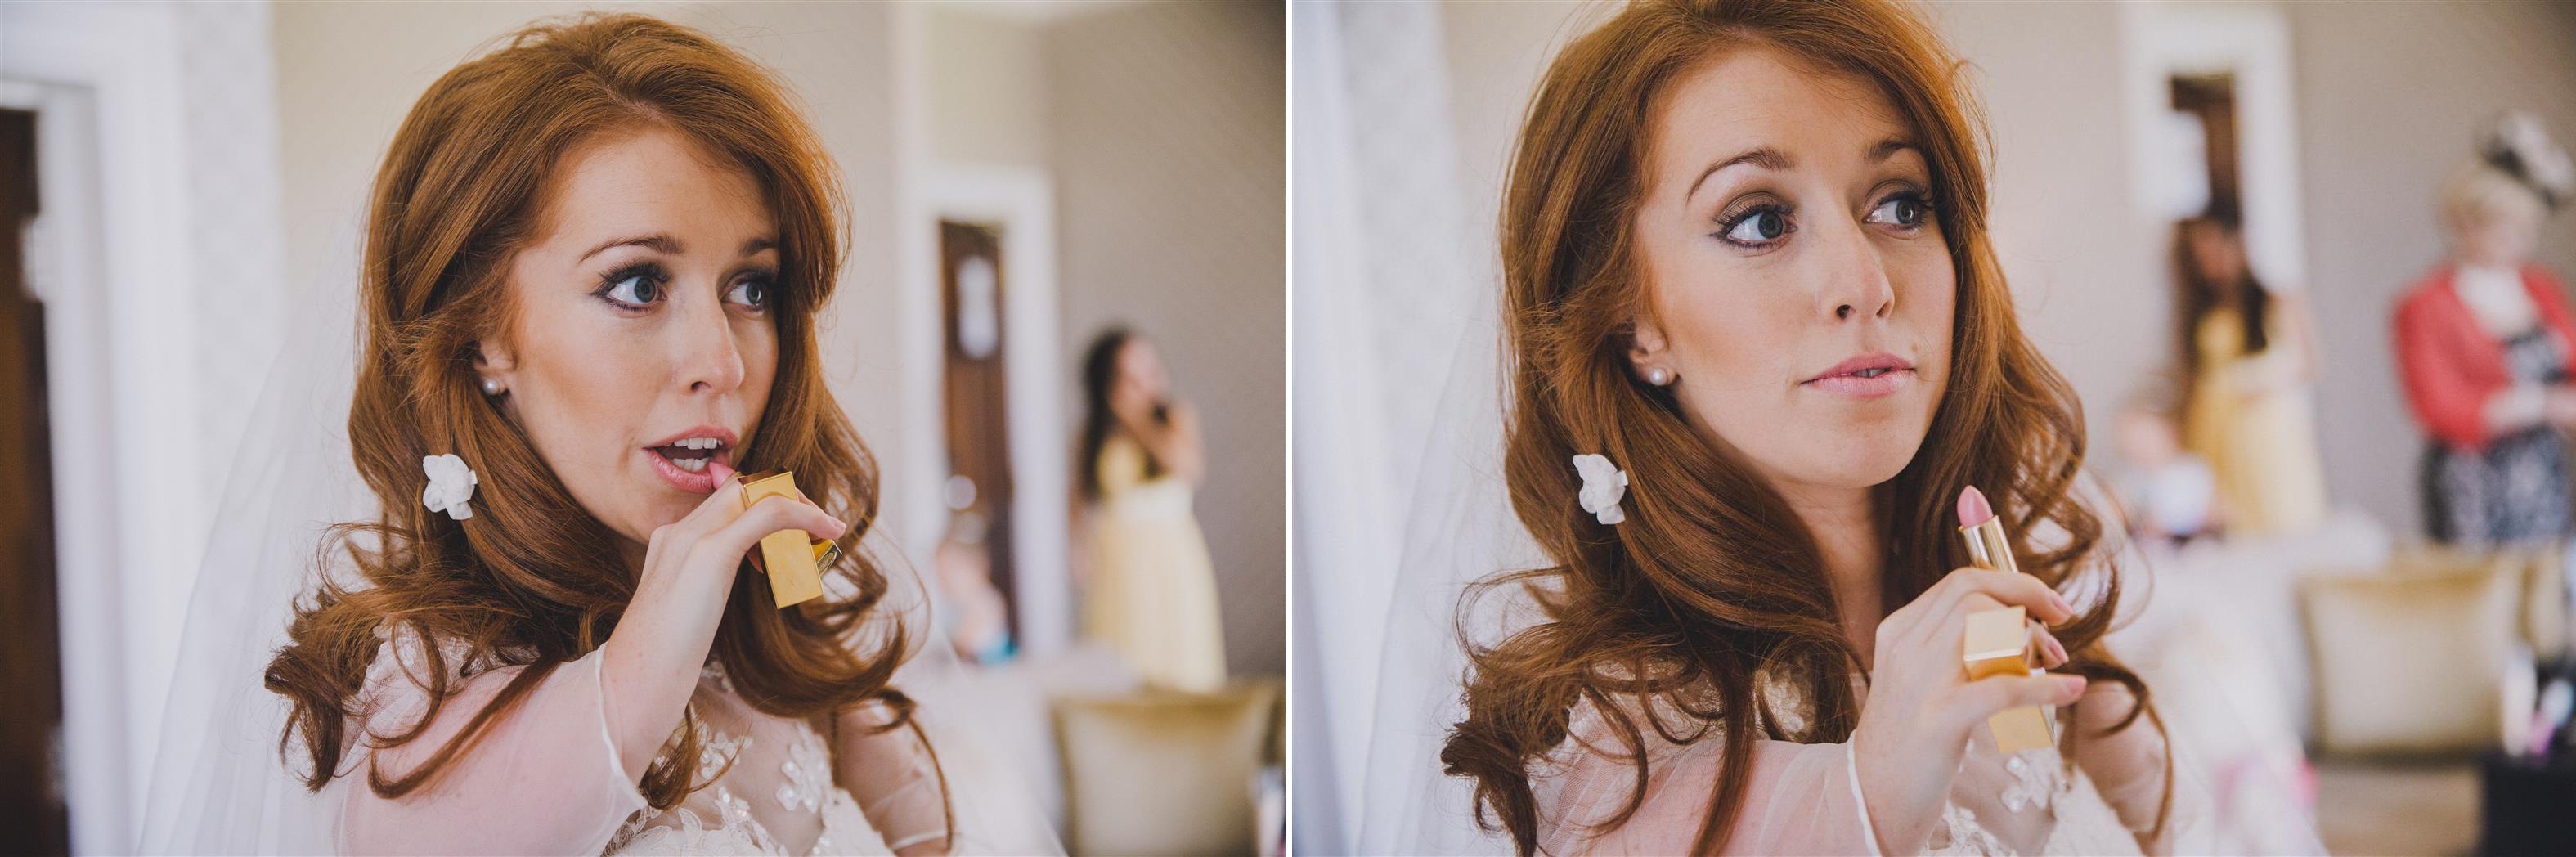 Bridal Makeup - A Spring 1960s Inspired Wedding